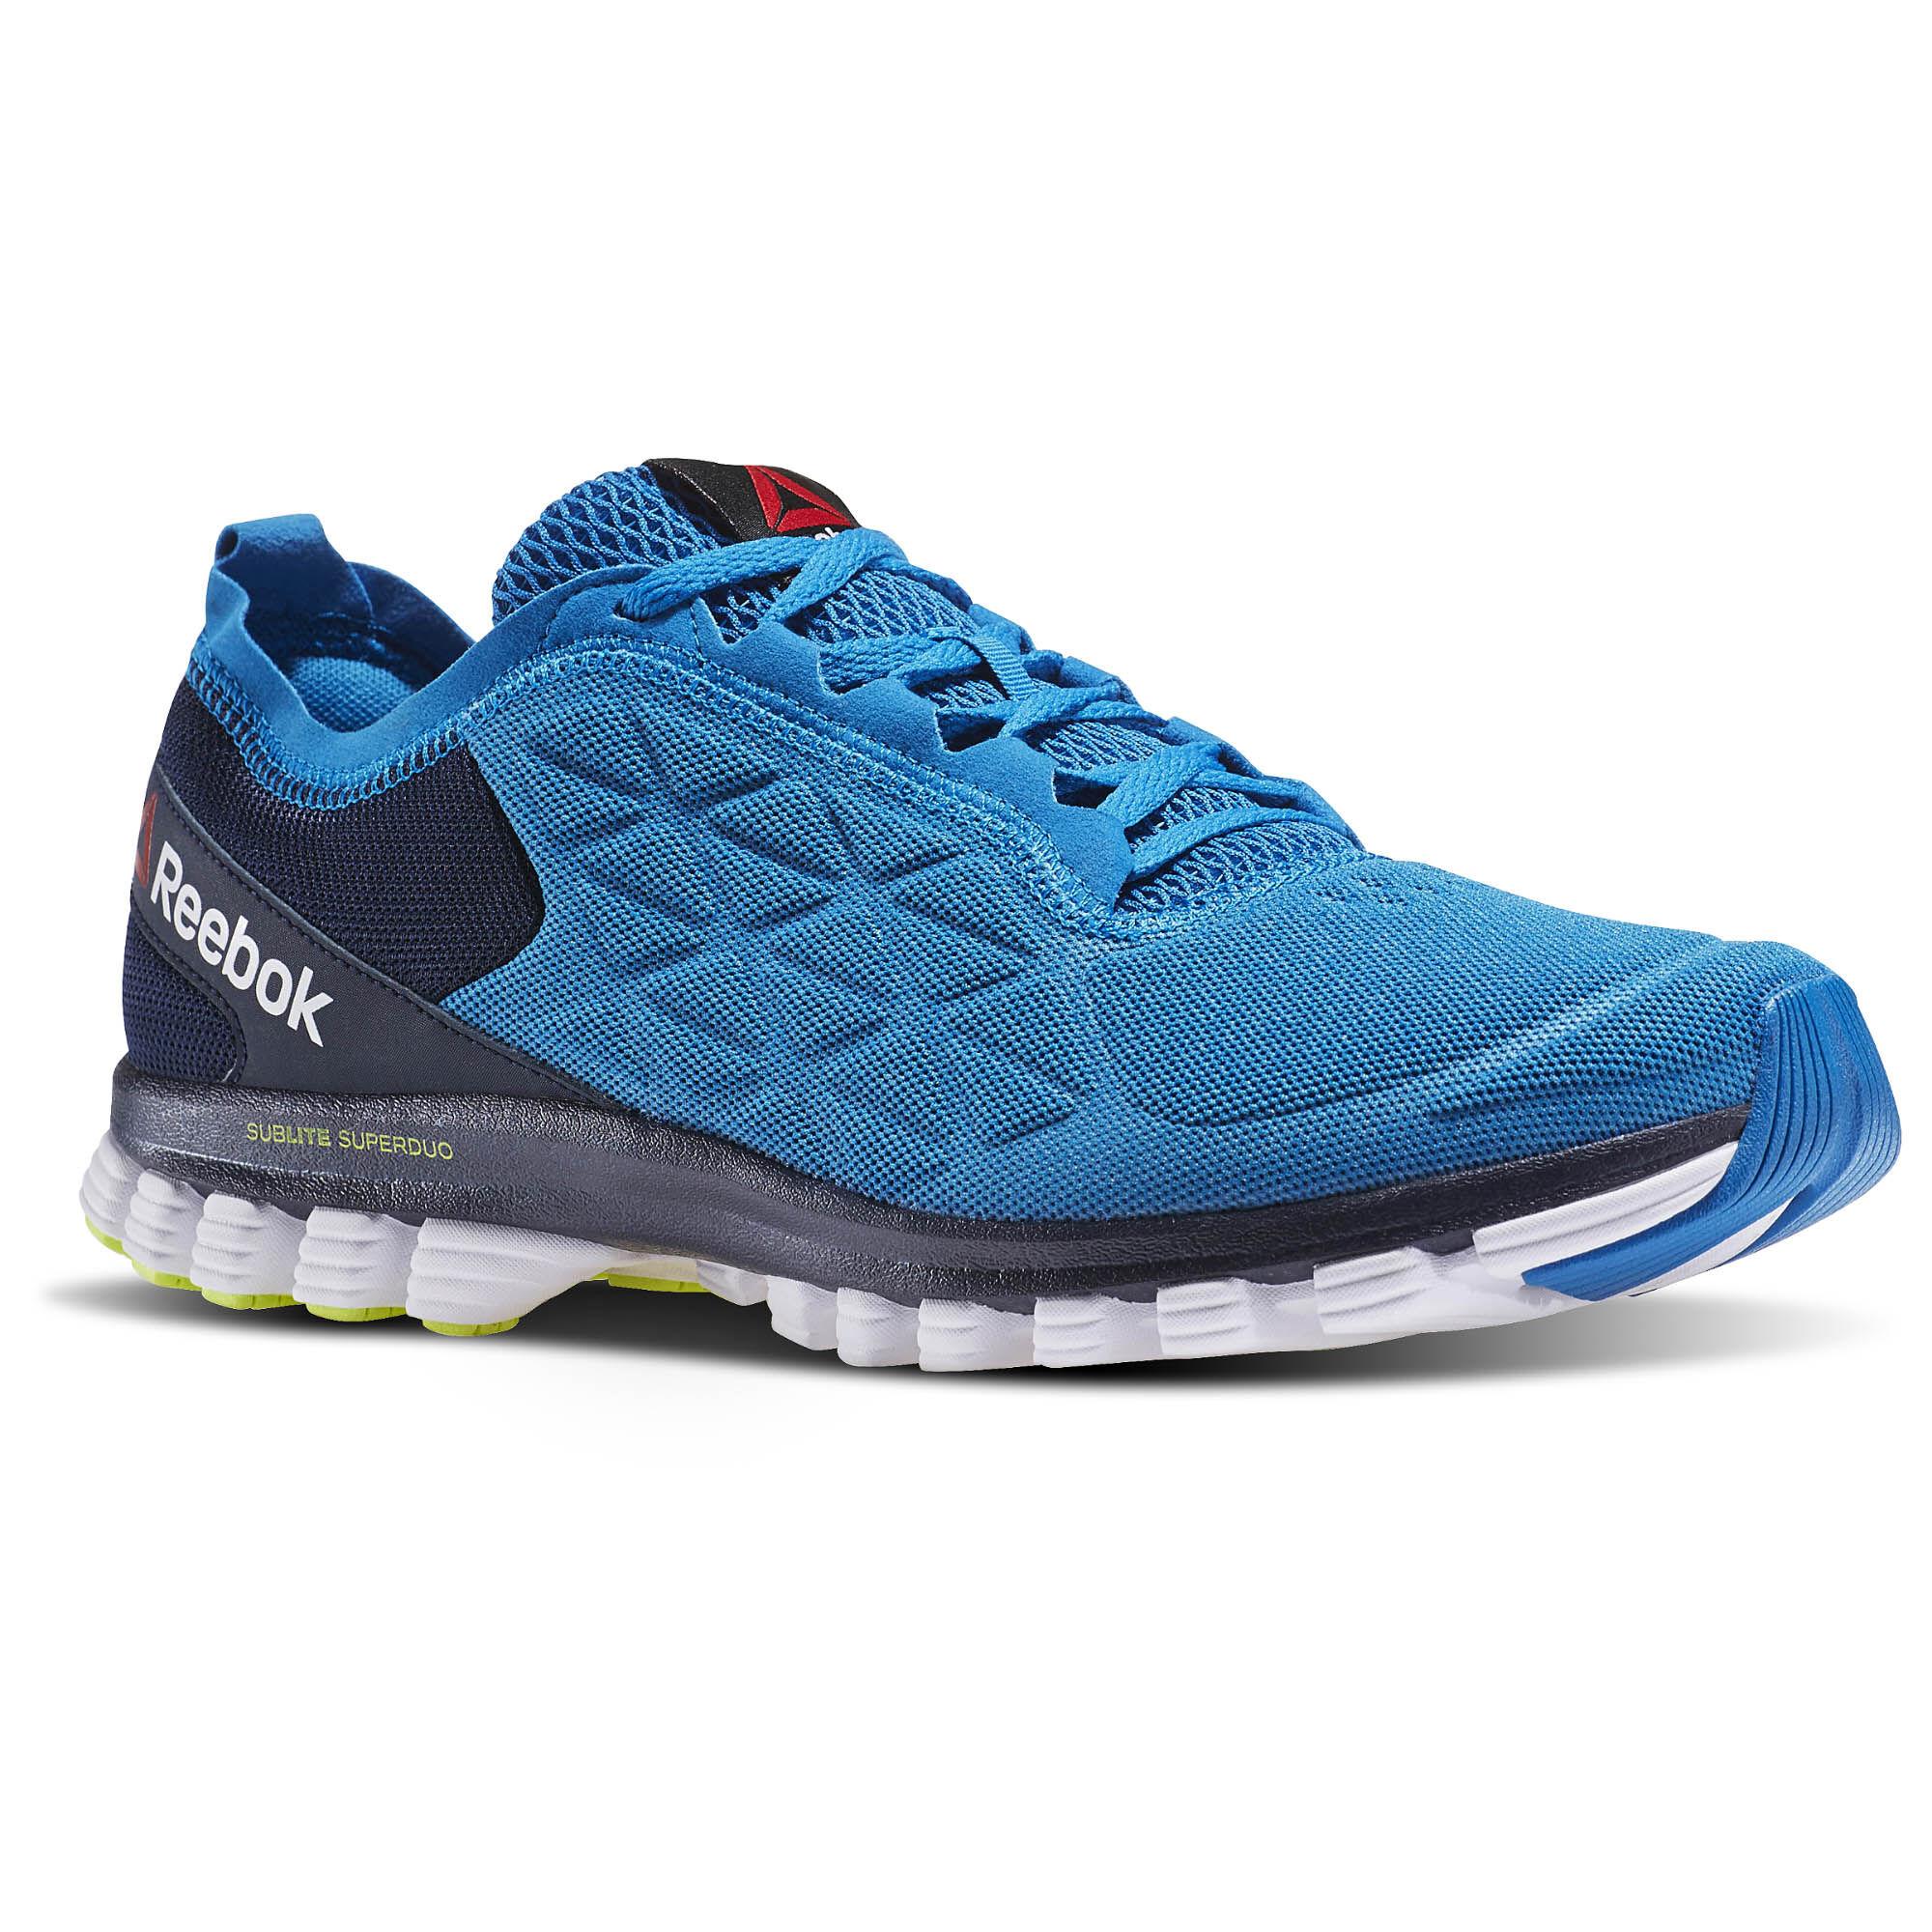 REEBOK SUBLITE SUPER Duo 3.0 BlackWhite Sportstyle Running Shoes 2016 AR2683